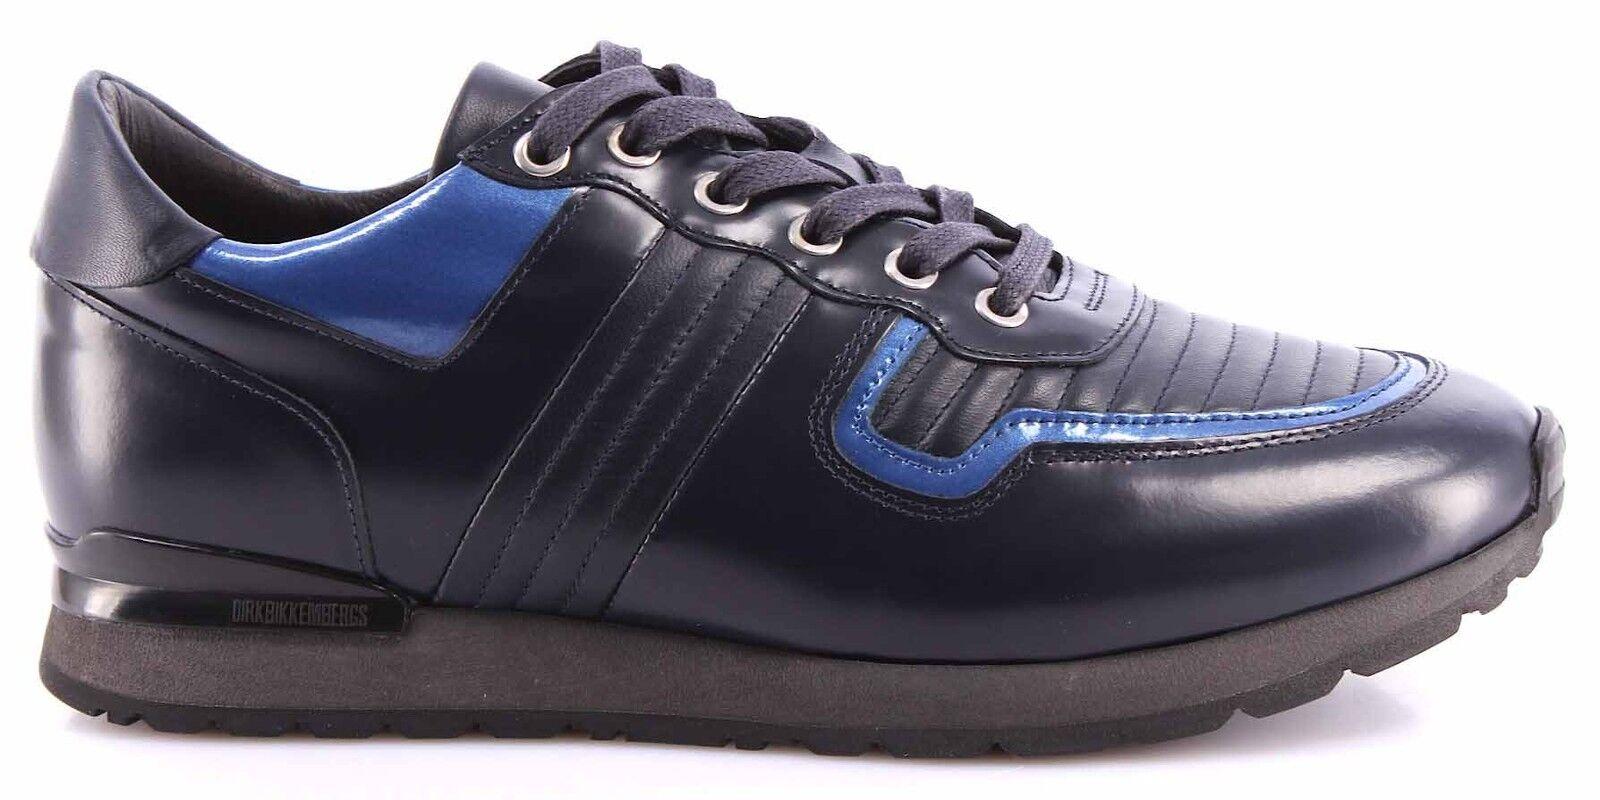 Scarpe Uomo Sneakers BIKKEMBERGS BKE 108231 Mant 380 LShoe M Leather Brushed Blu